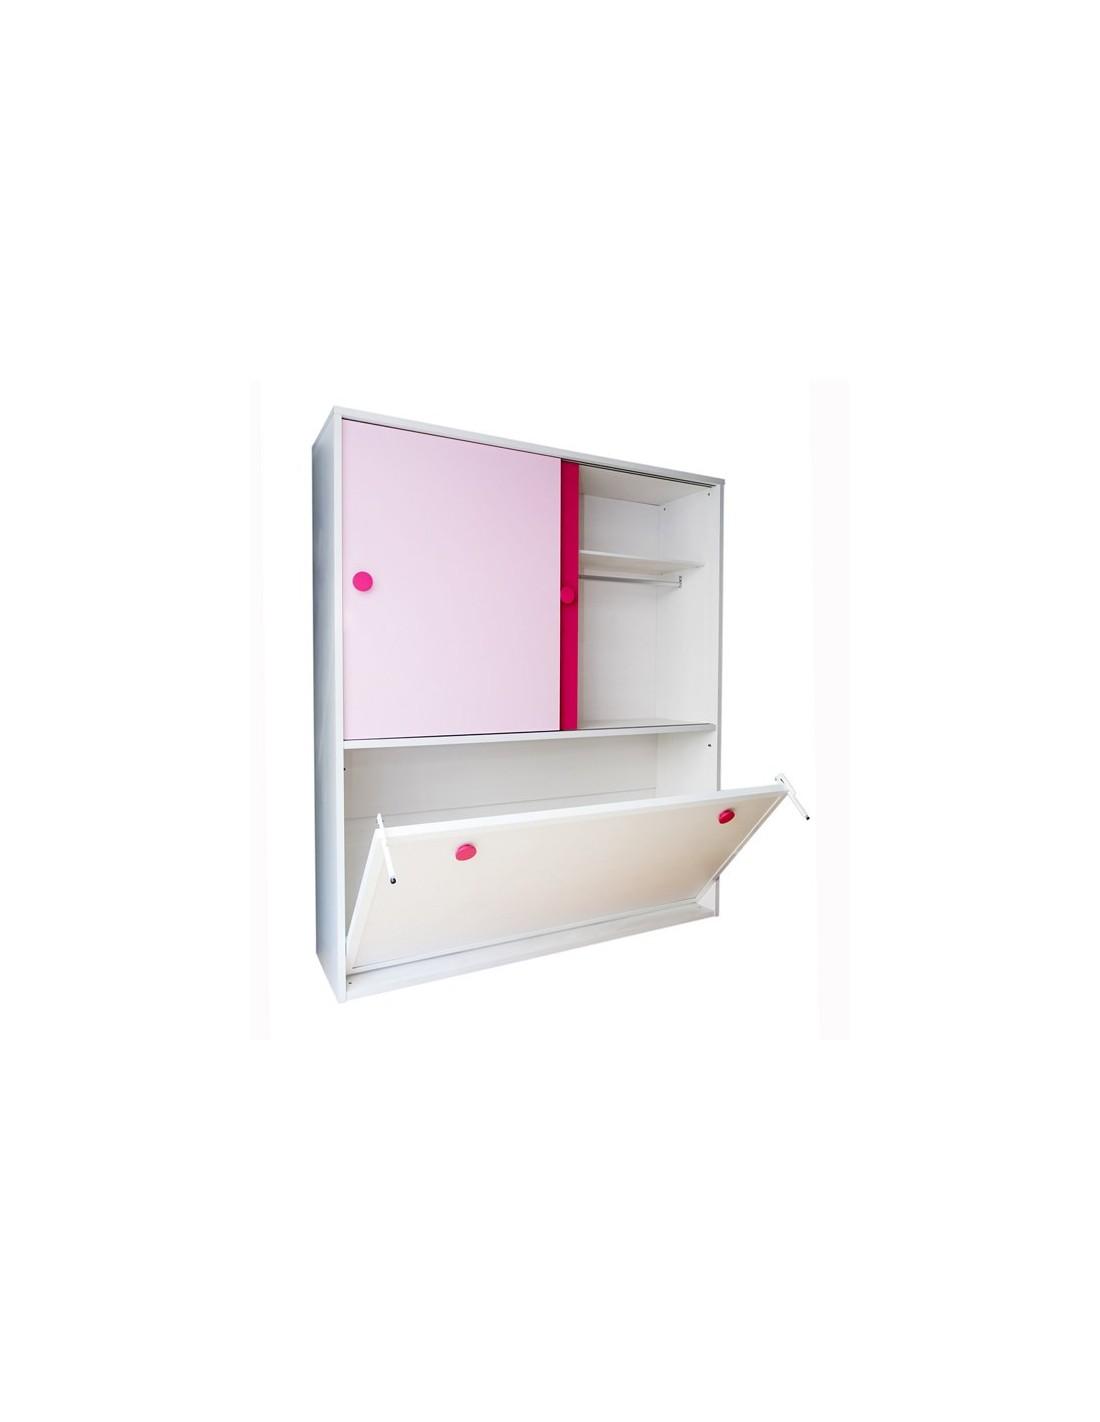 Adesivo De Banheiro Infantil ~ Cama abatible horizontal con armario en oferta Muebles Noel